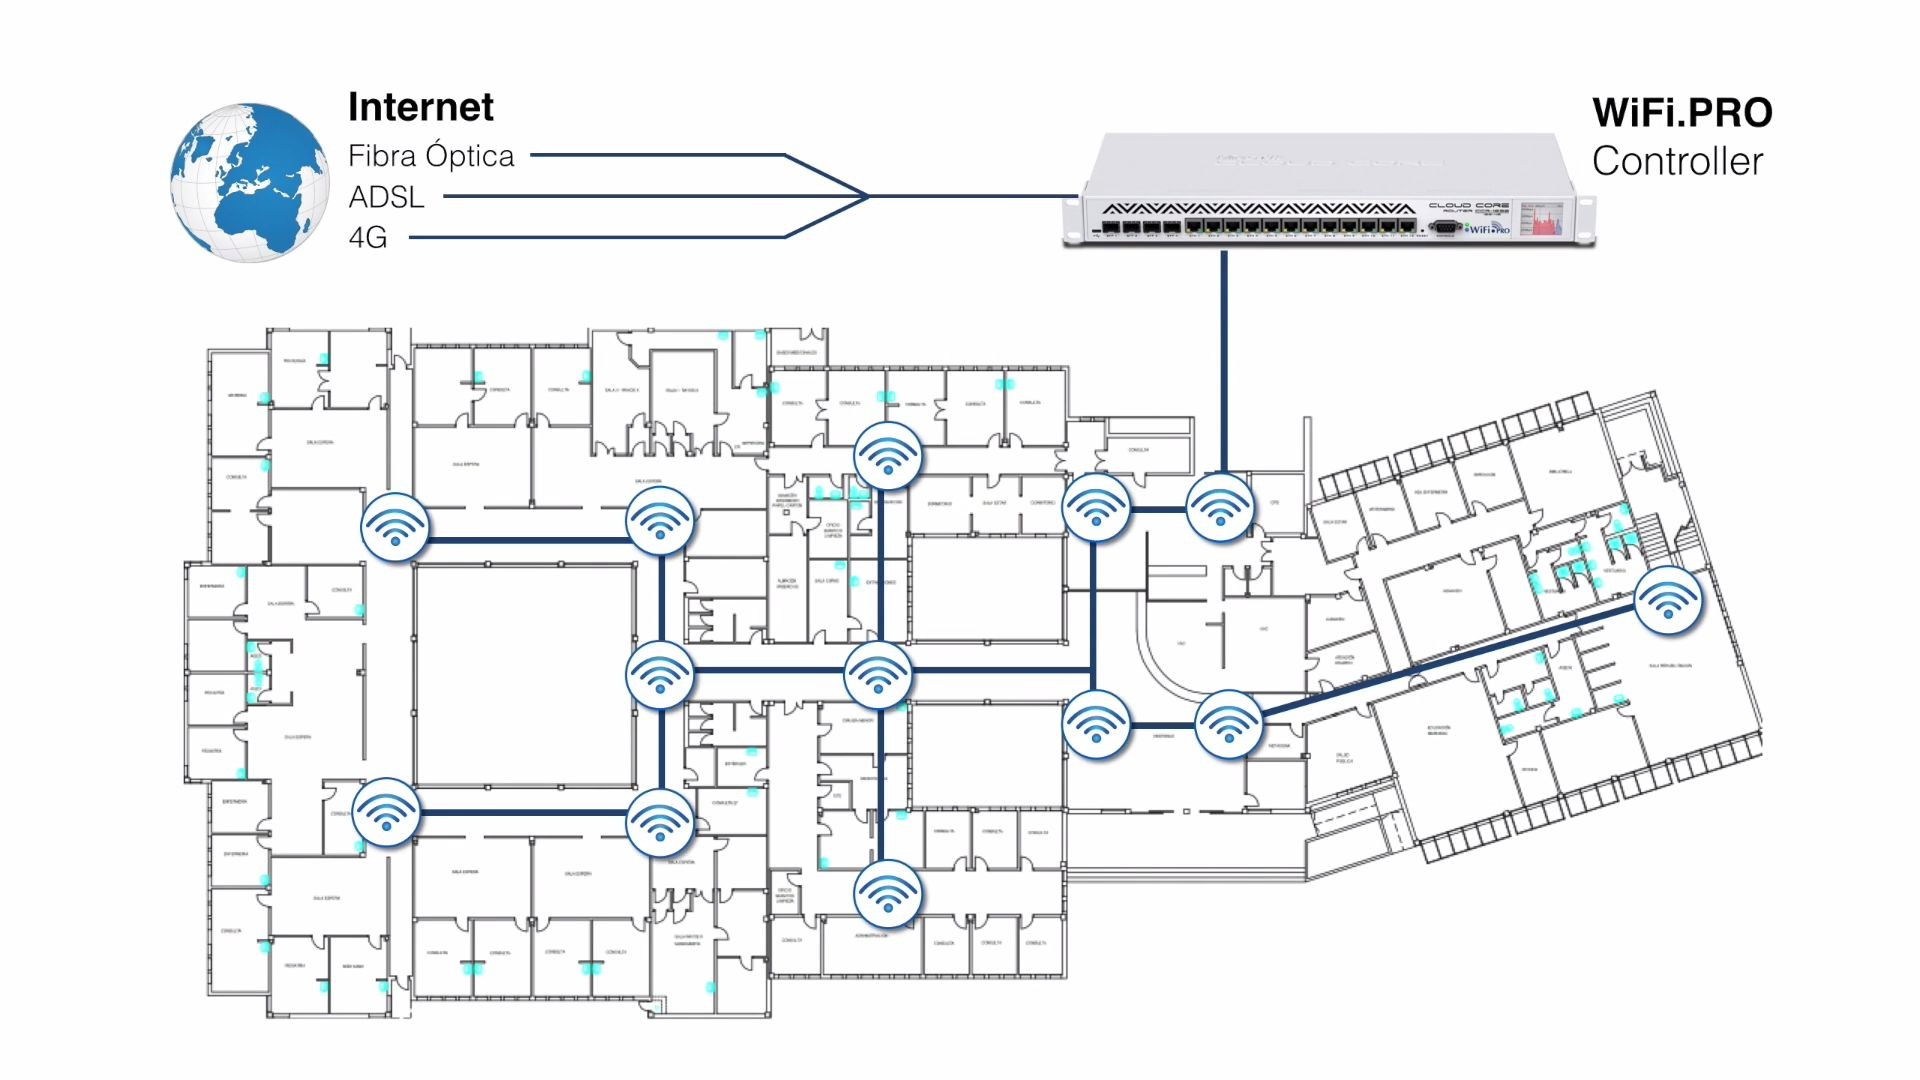 WiFi.PRO - 02 Gestion del controller